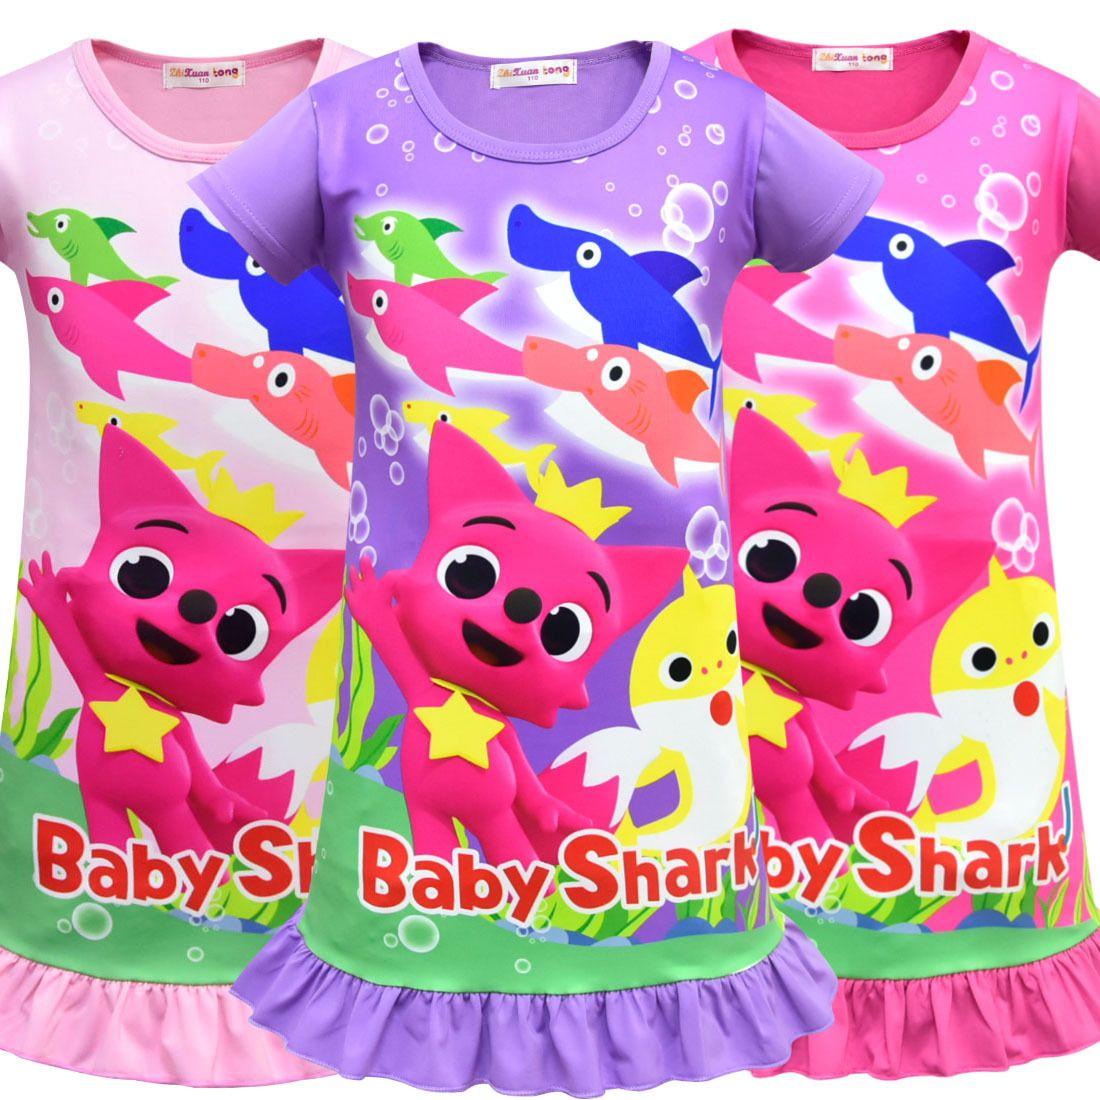 cf7f990e Girls Baby Shark Dress Clothes Lovely Children Short Sleeve Cartoon  Pinkfong Pajamas Dress Shark Print Infant Dresses Baby Sumer Night Skirt  Sweater Dresses ...